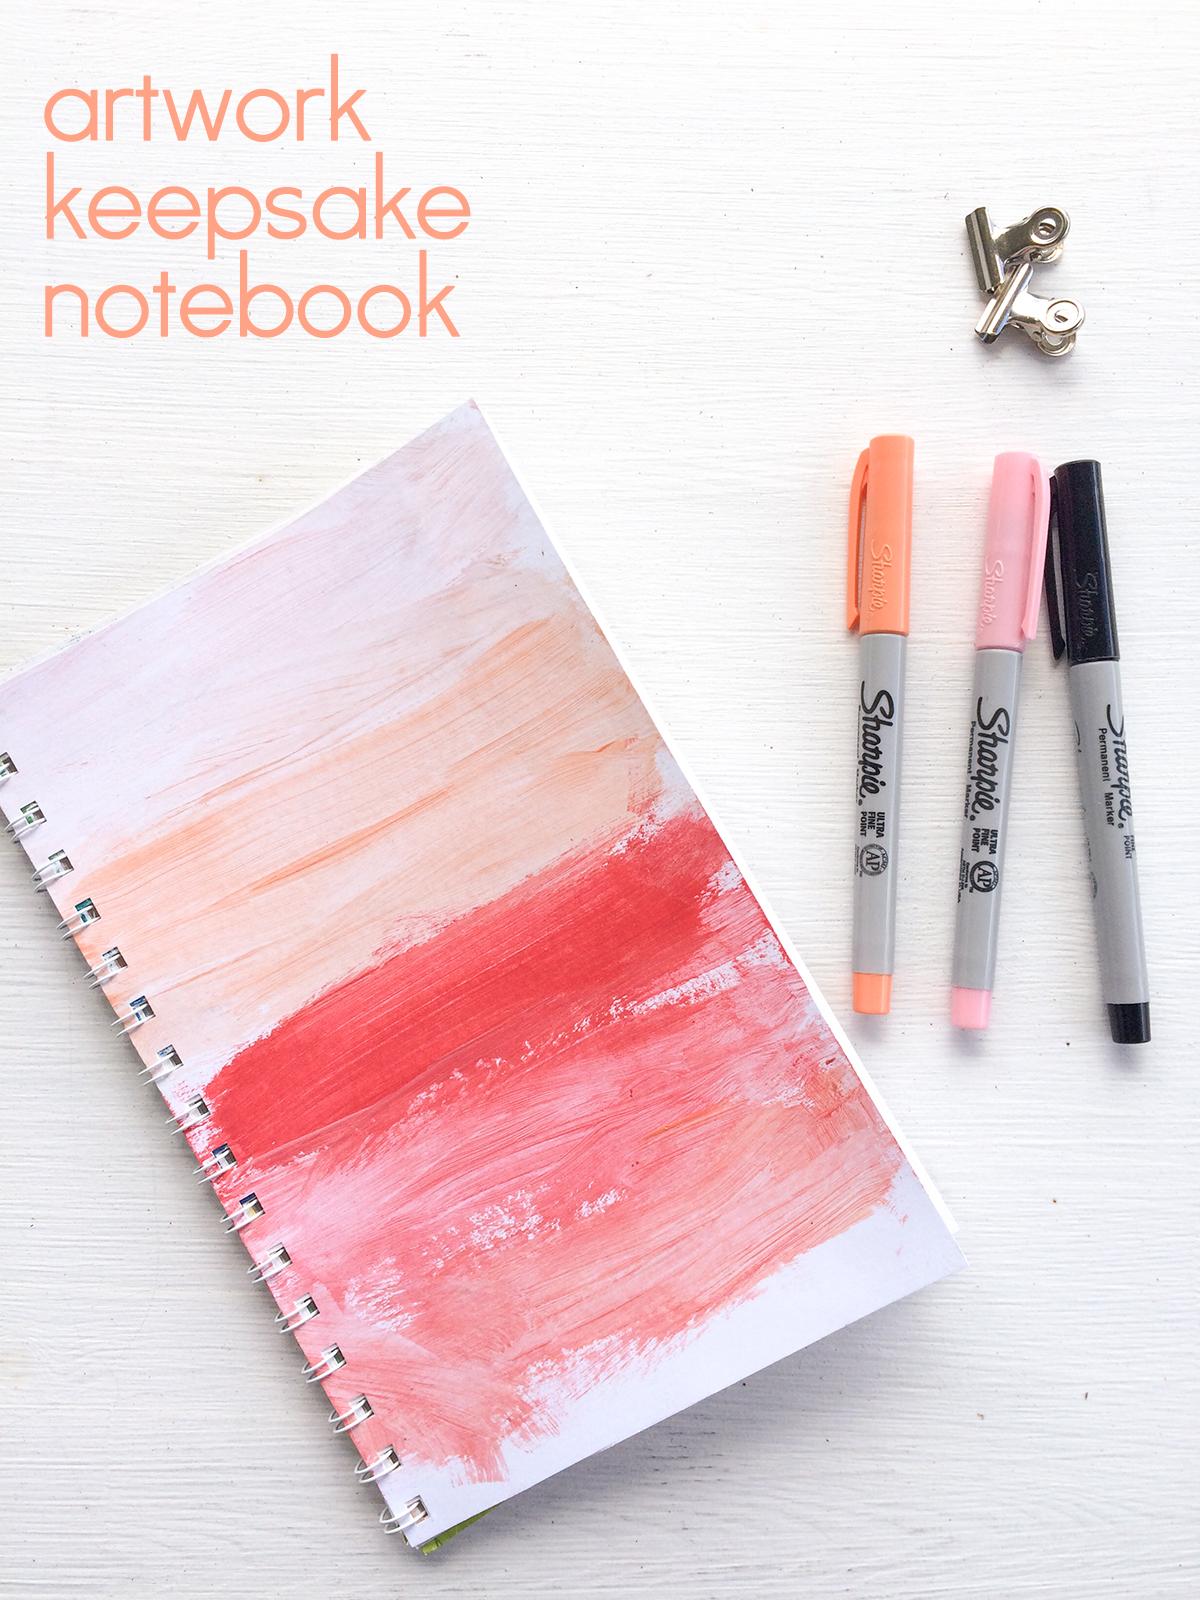 artworkkeepsakenotebook